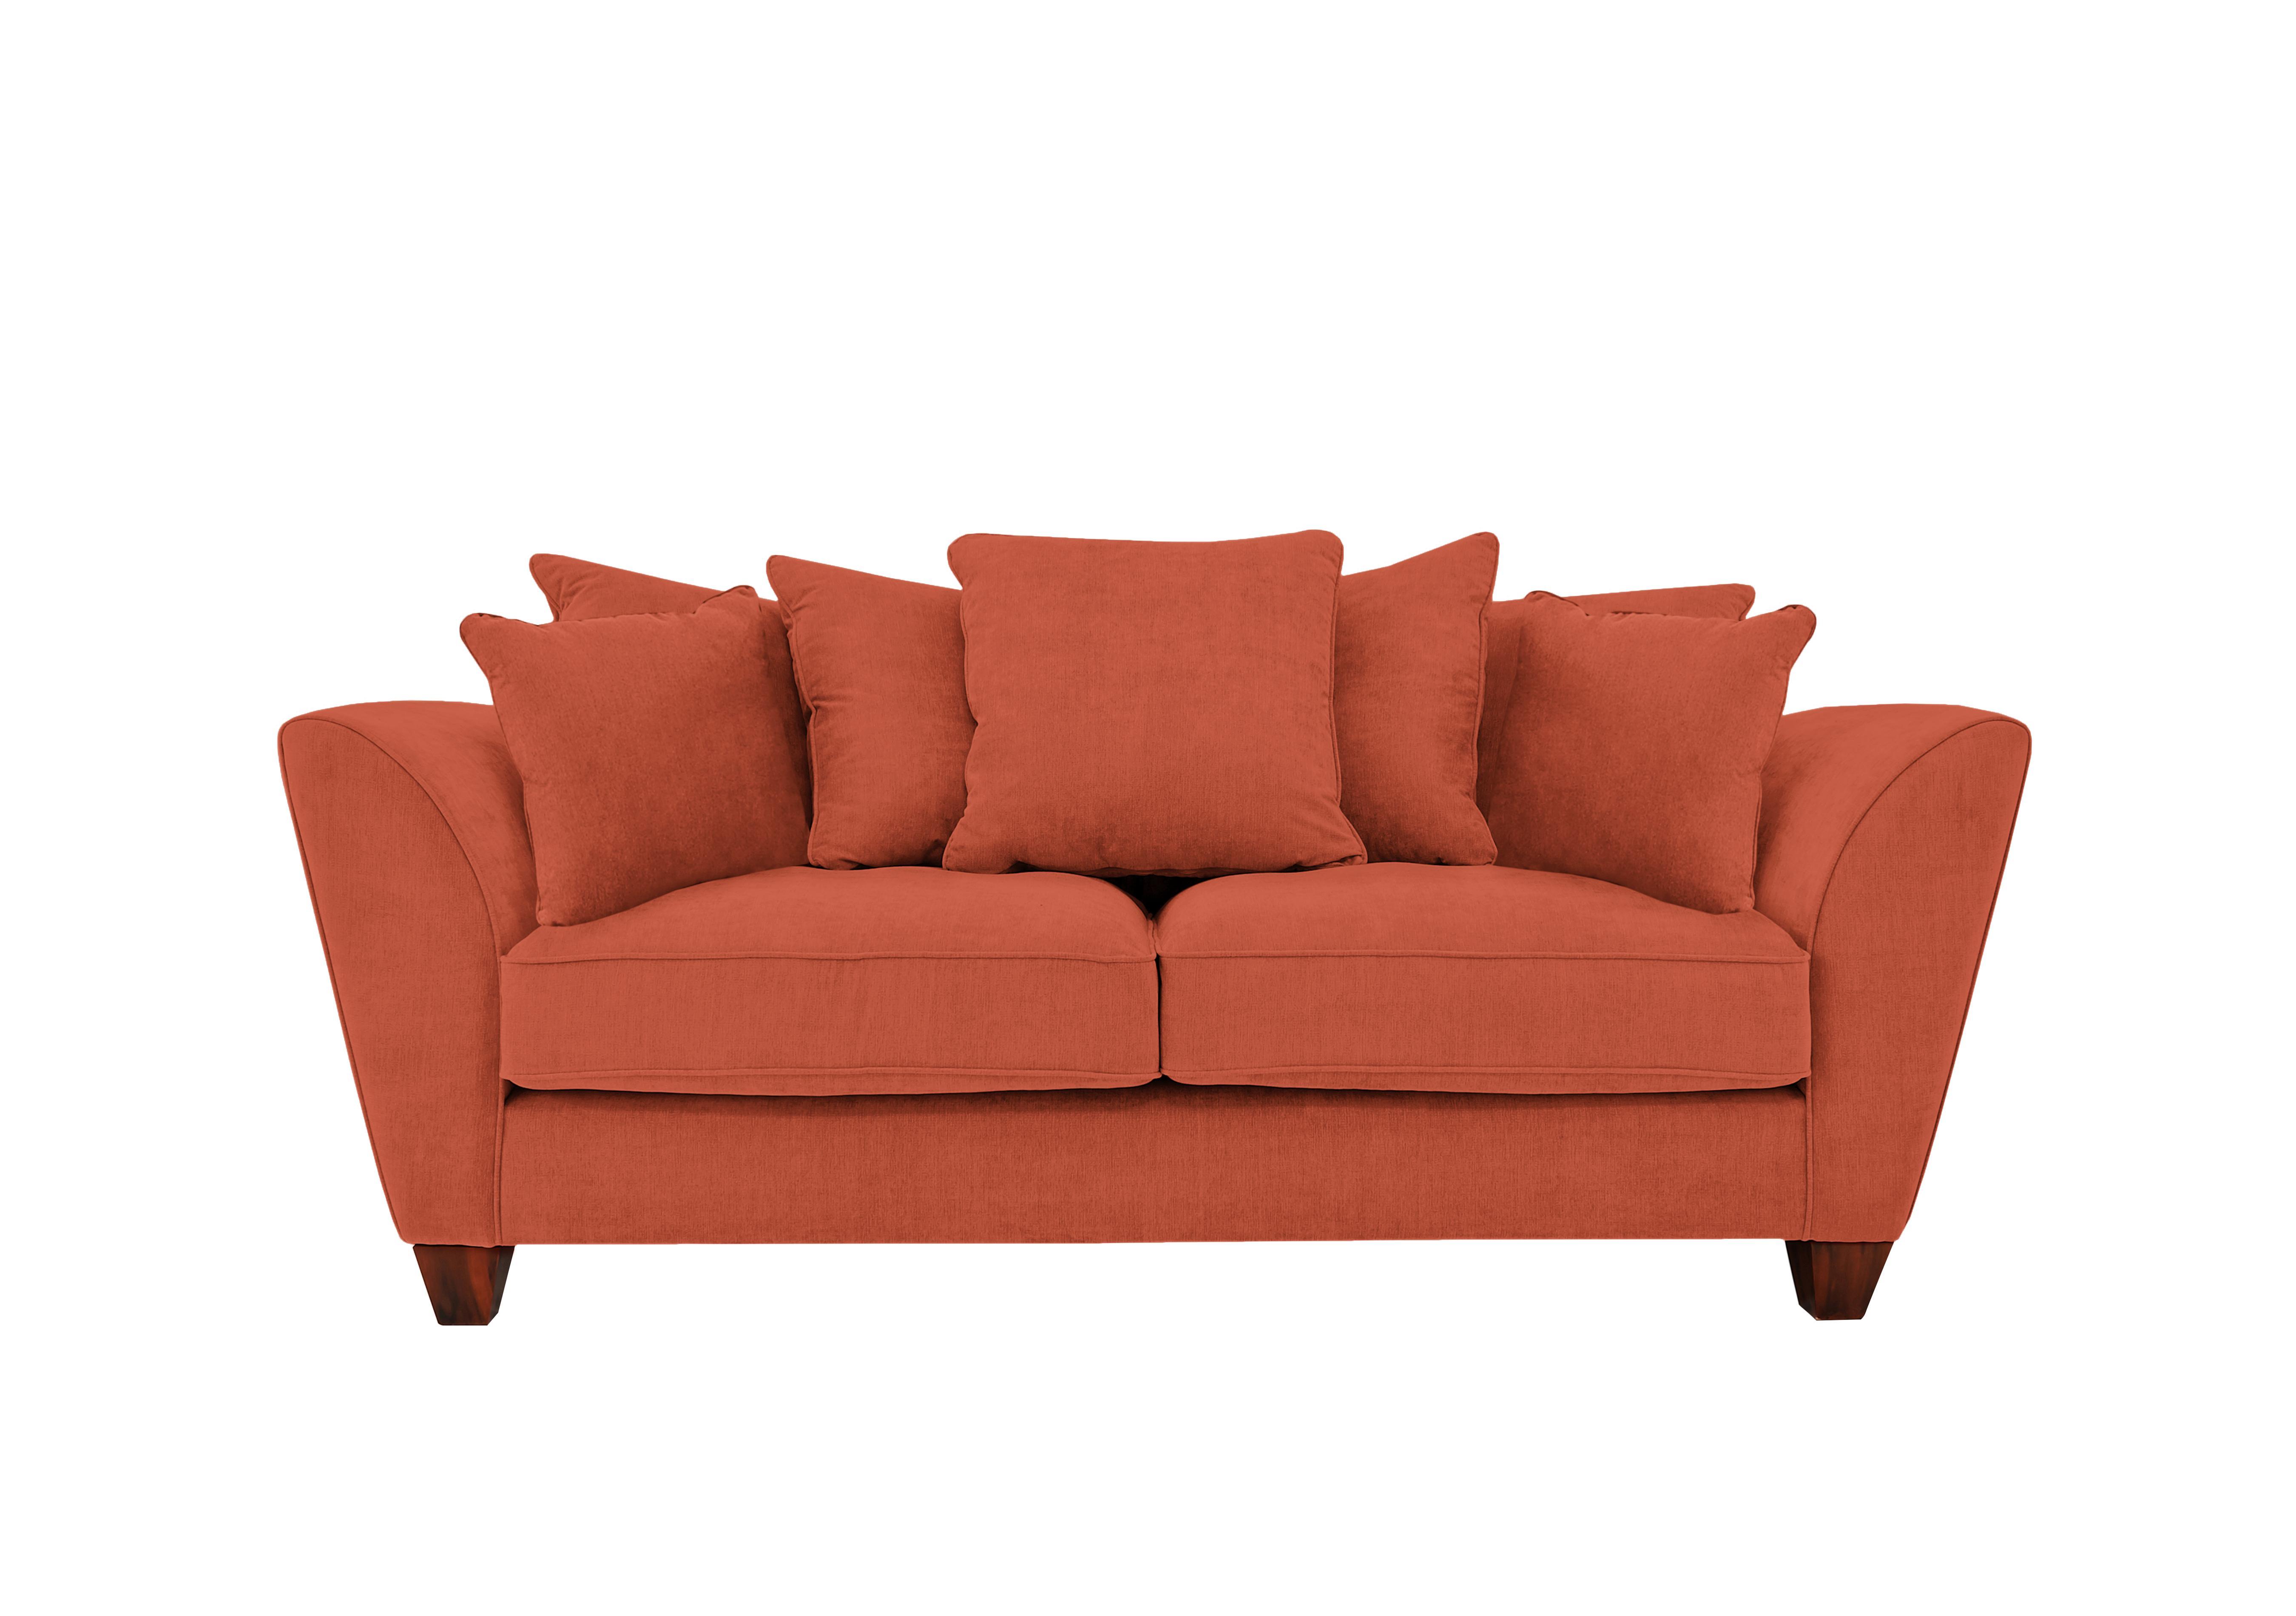 Marvelous Tangier 3 Seater Pillow Back Fabric Sofa